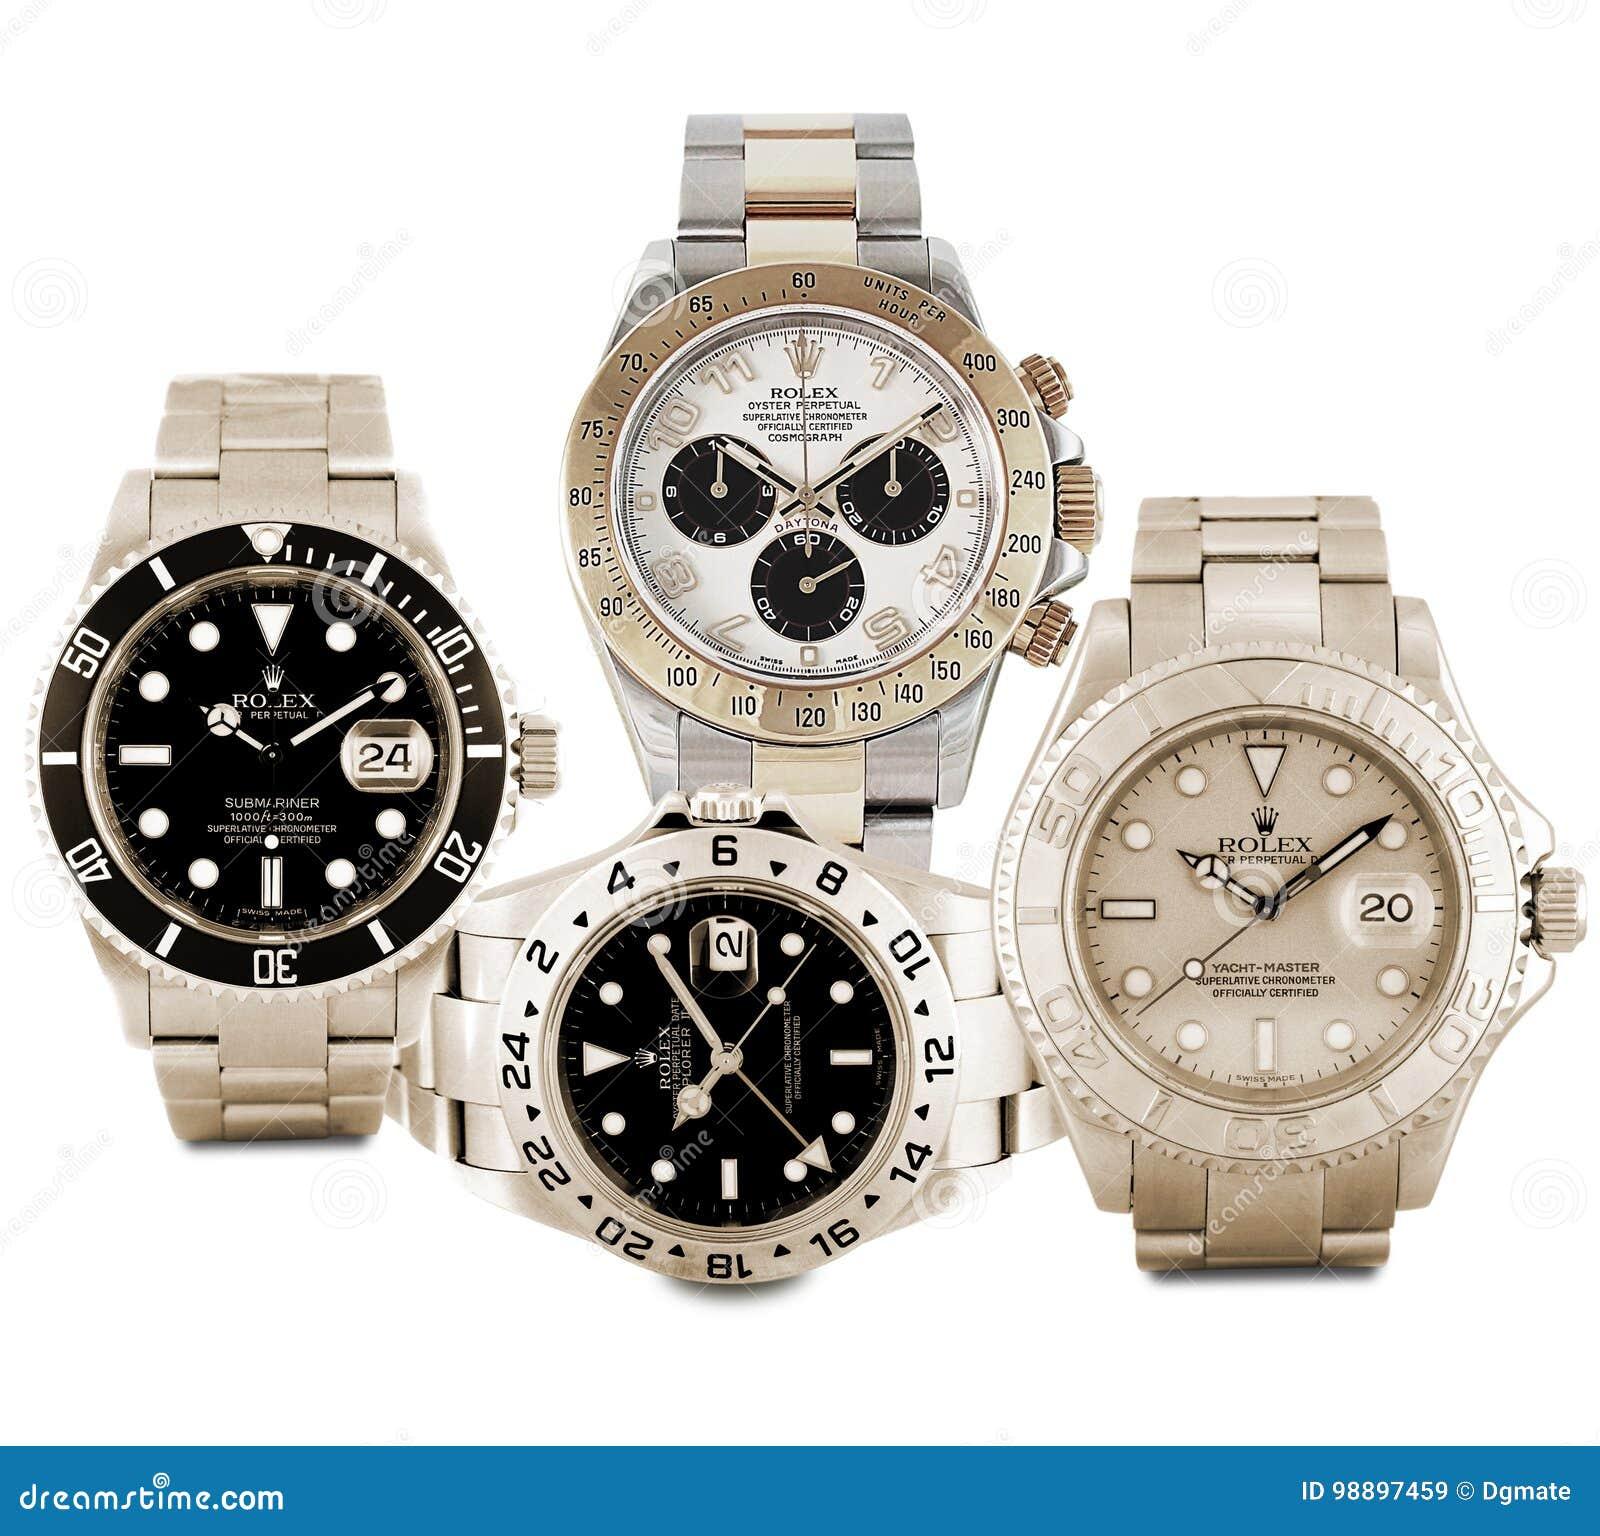 b3c5346b64bab4 Orologi di Rolex immagine stock editoriale. Immagine di lifestyle ...